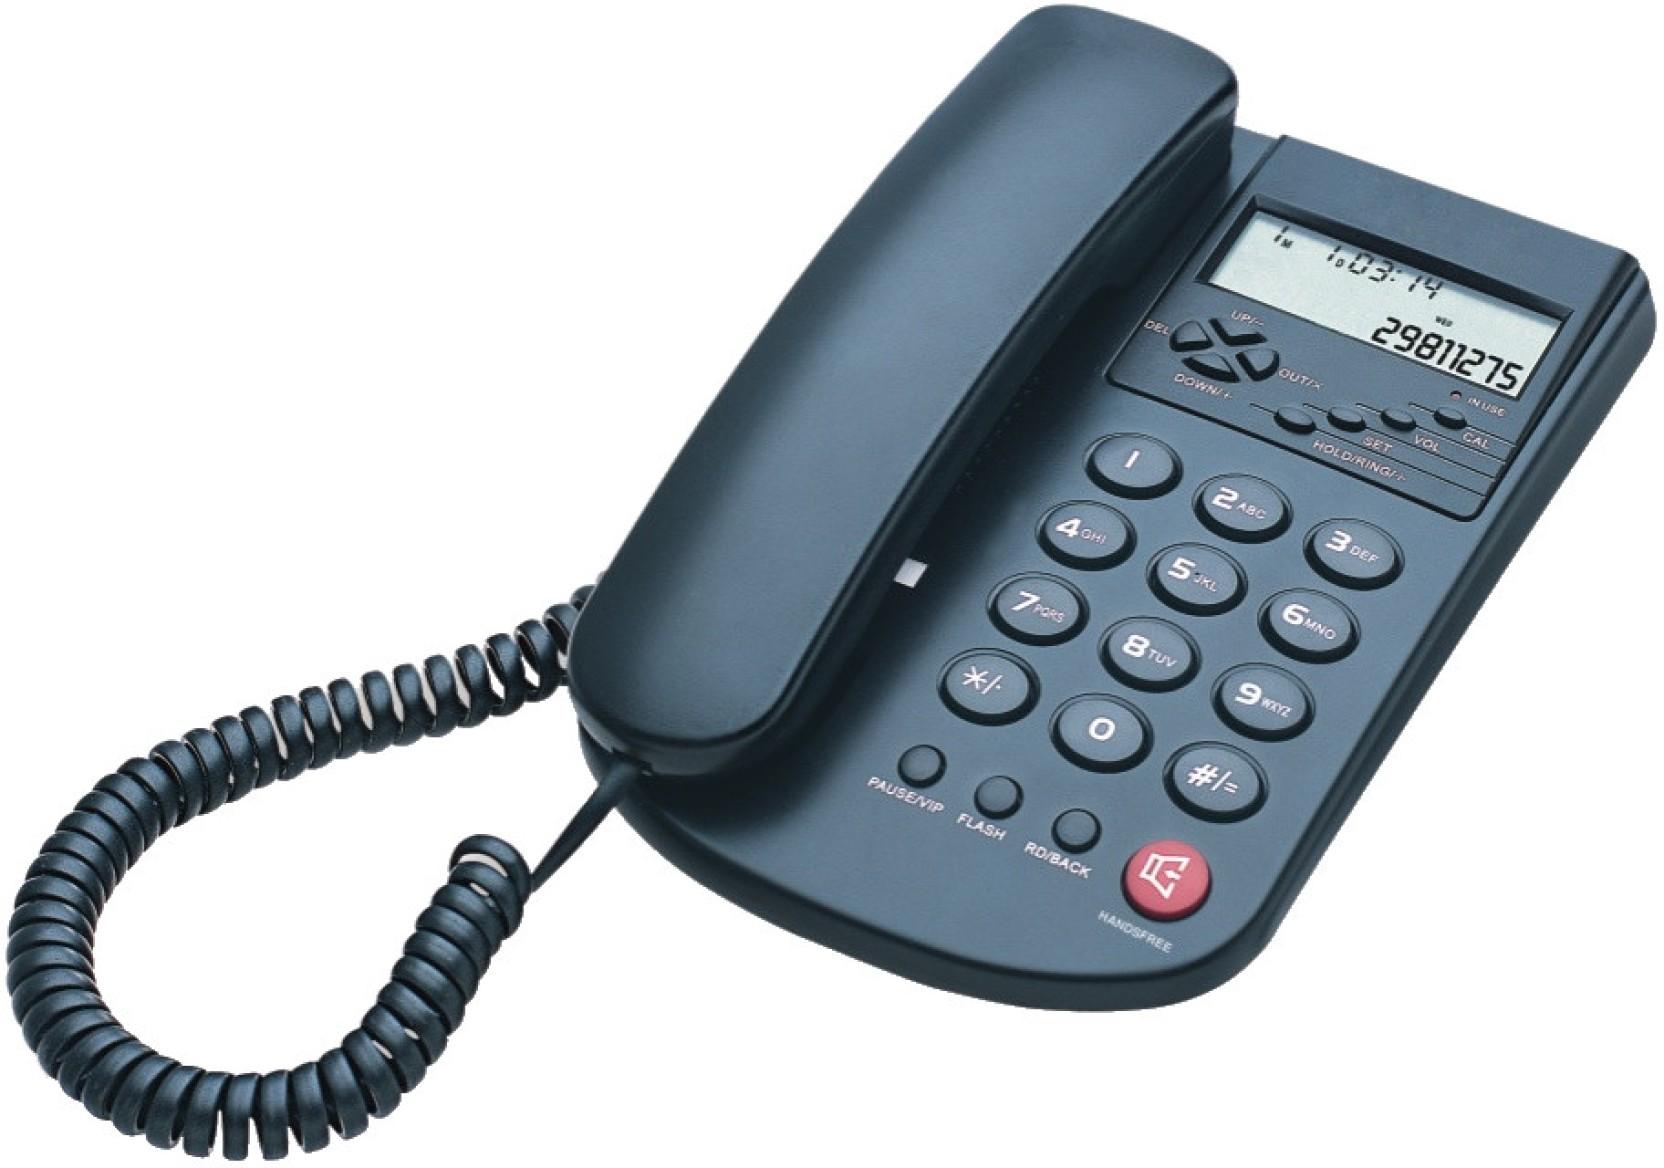 BEETEL LANDLINE PHONE M75 User's guide, Instructions ...